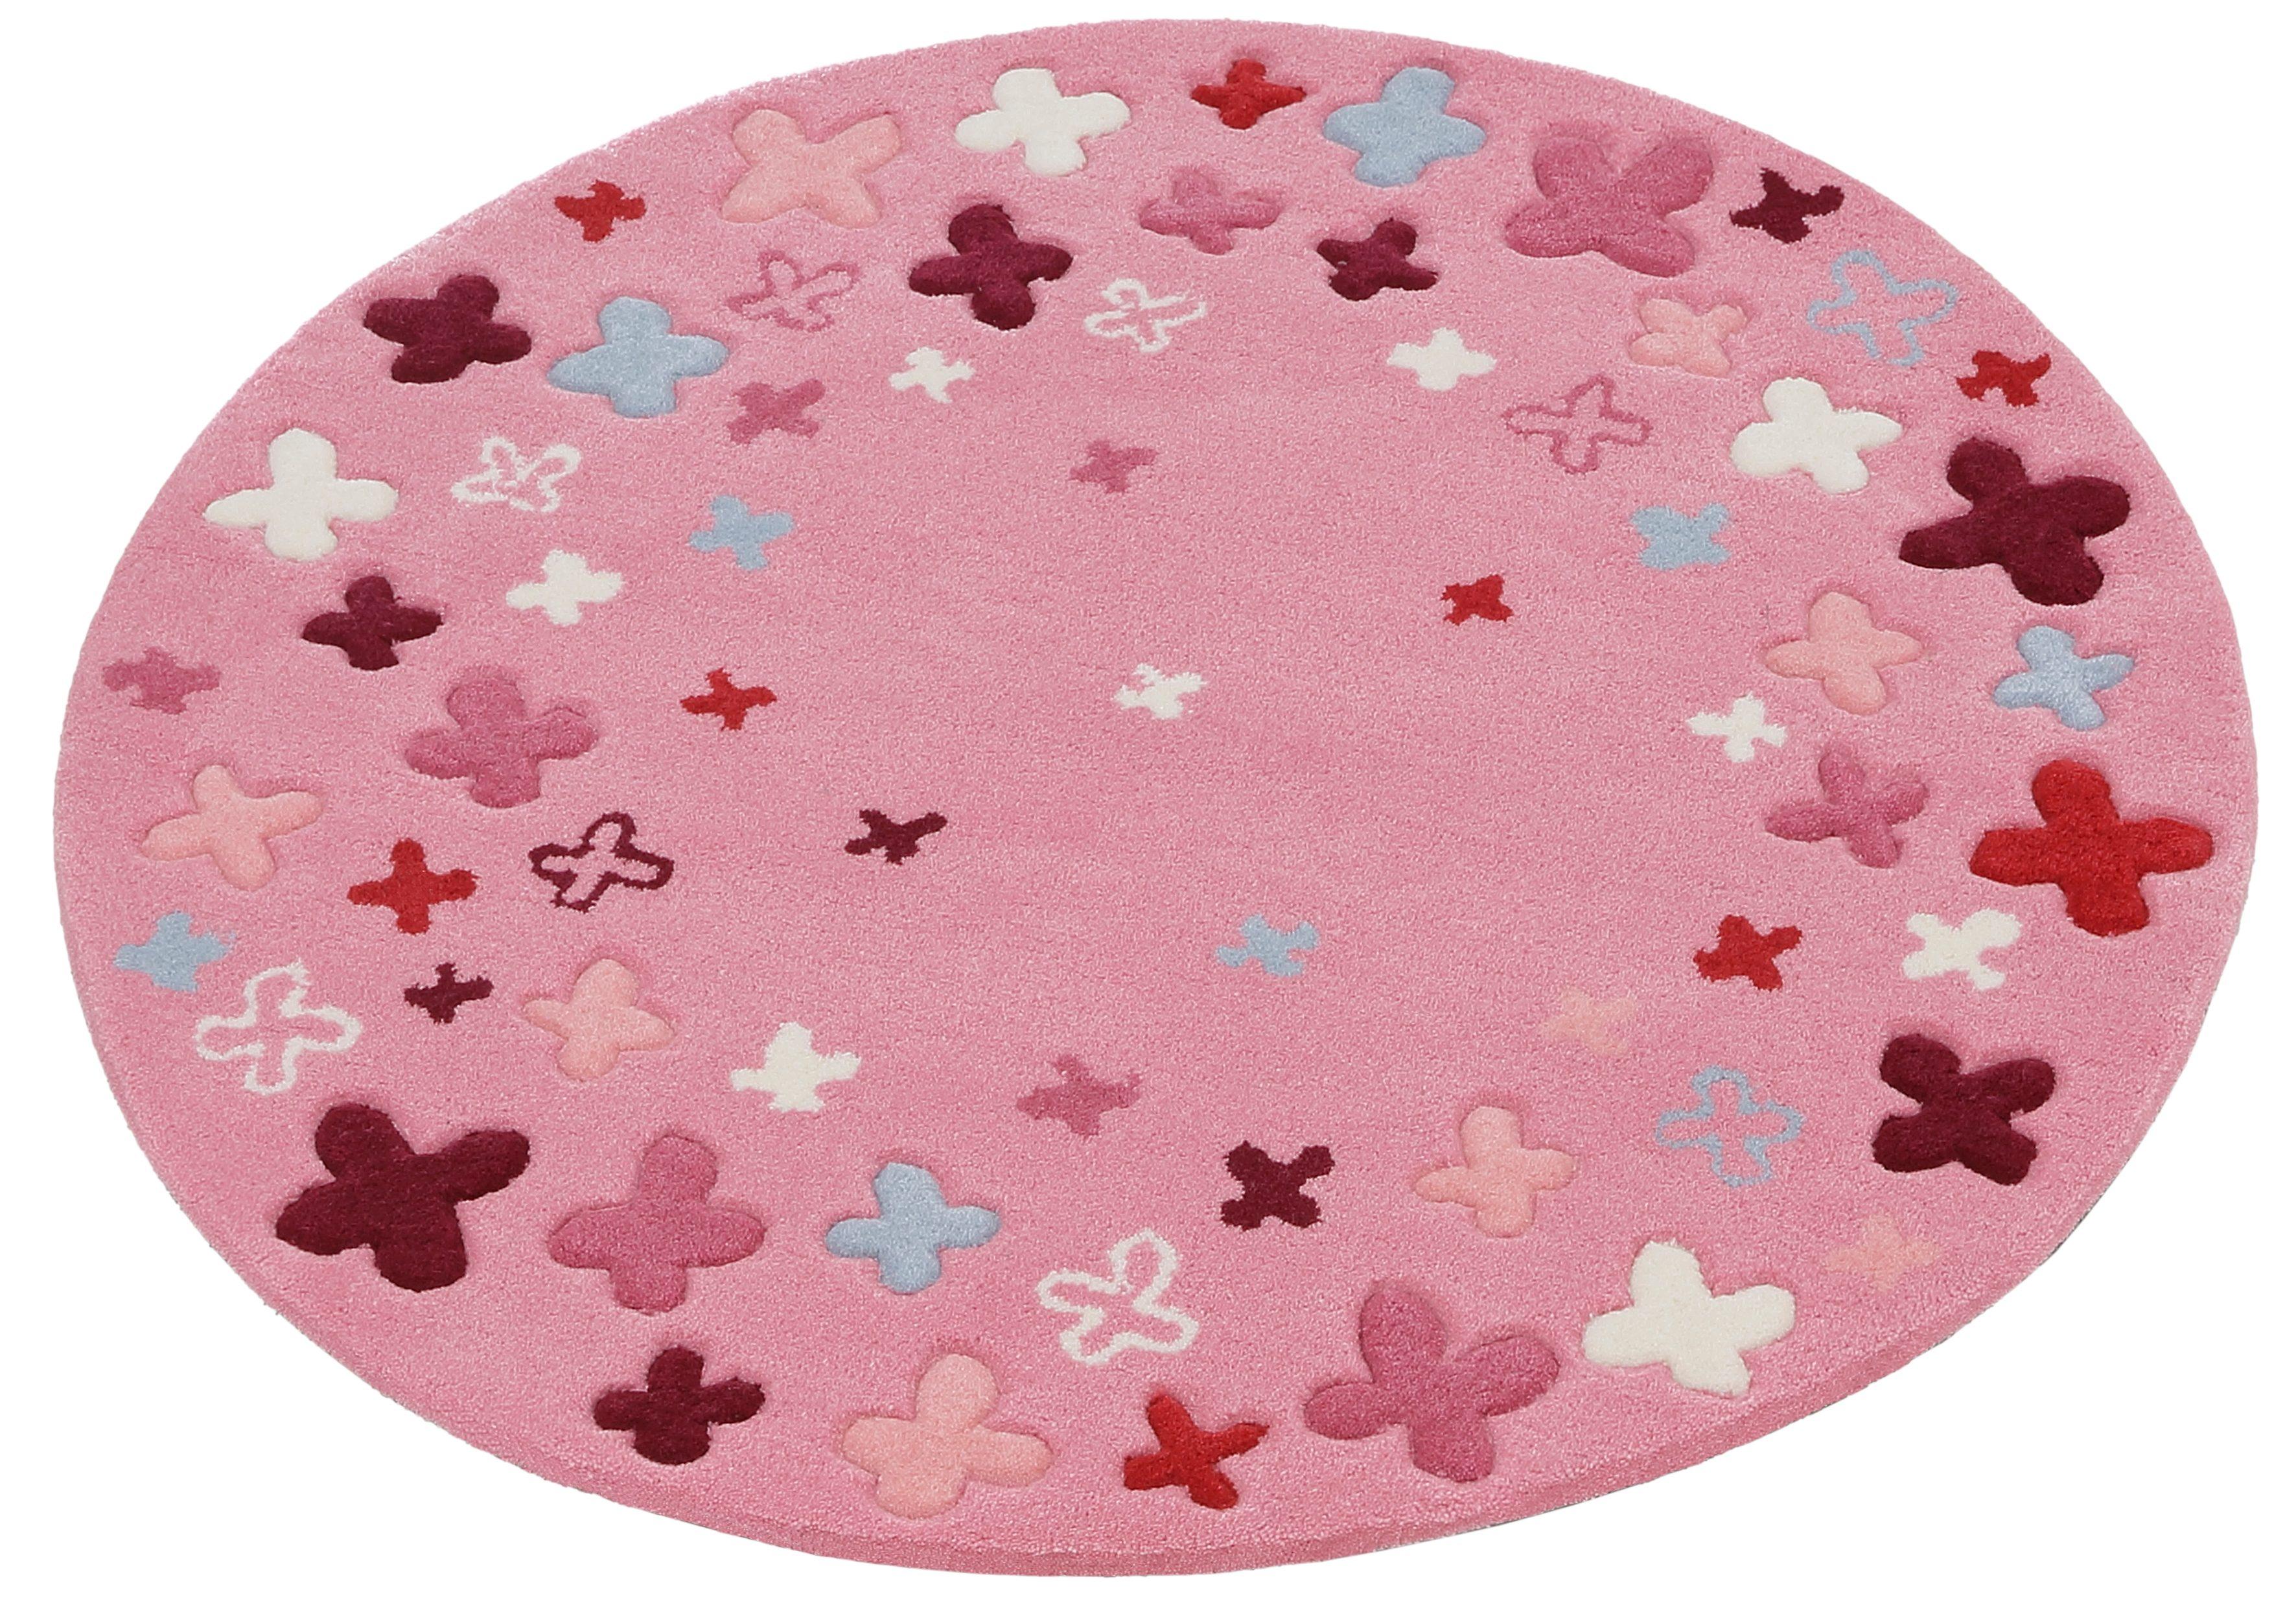 Teppich Schmetterling Rosa ~ Teppich madchen kinderteppich grun ikea schmetterling u esb